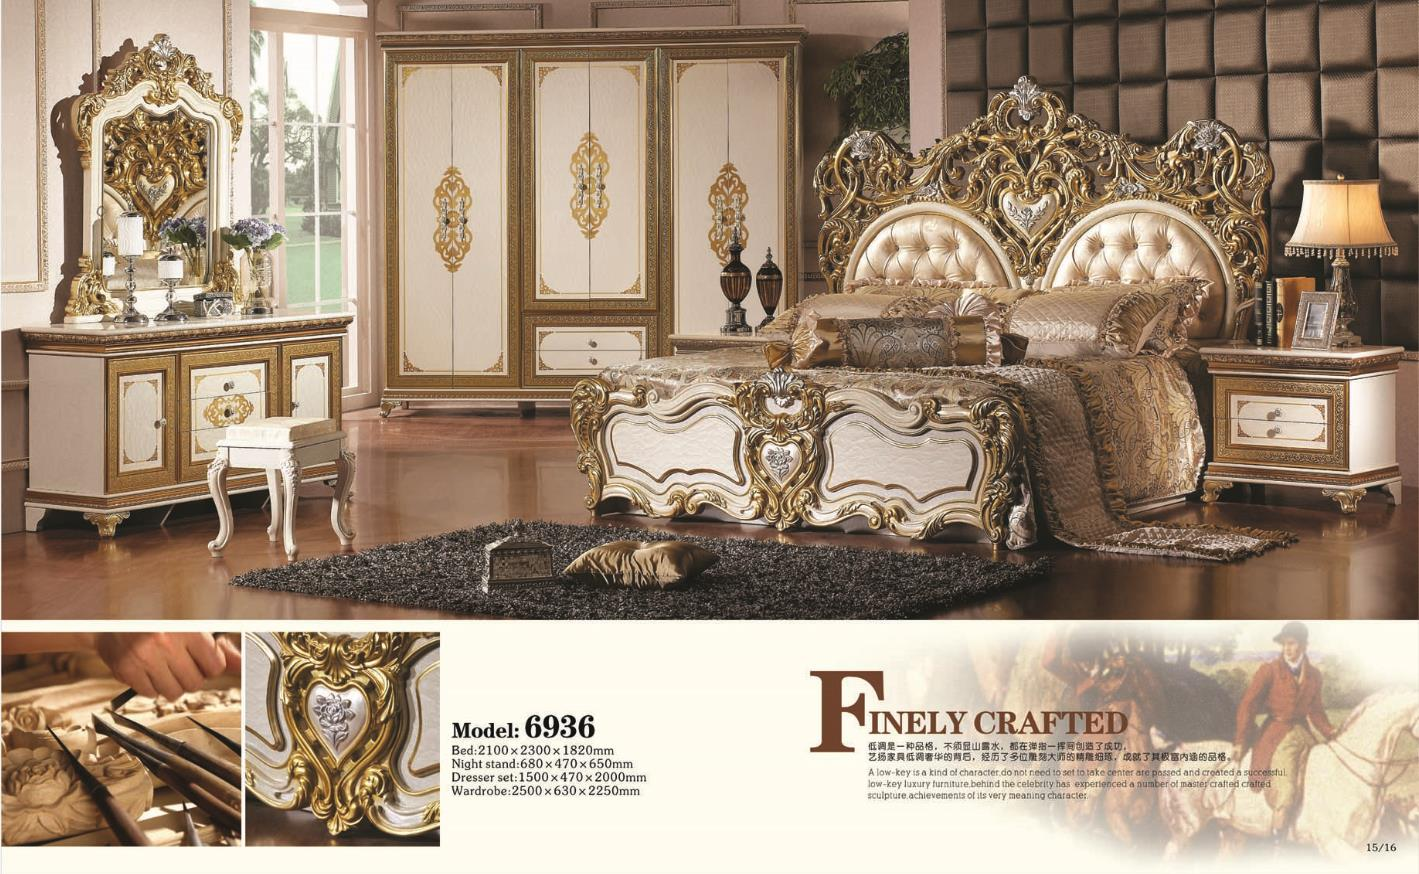 6936 60374767110 European Royal Style Bedroom Set